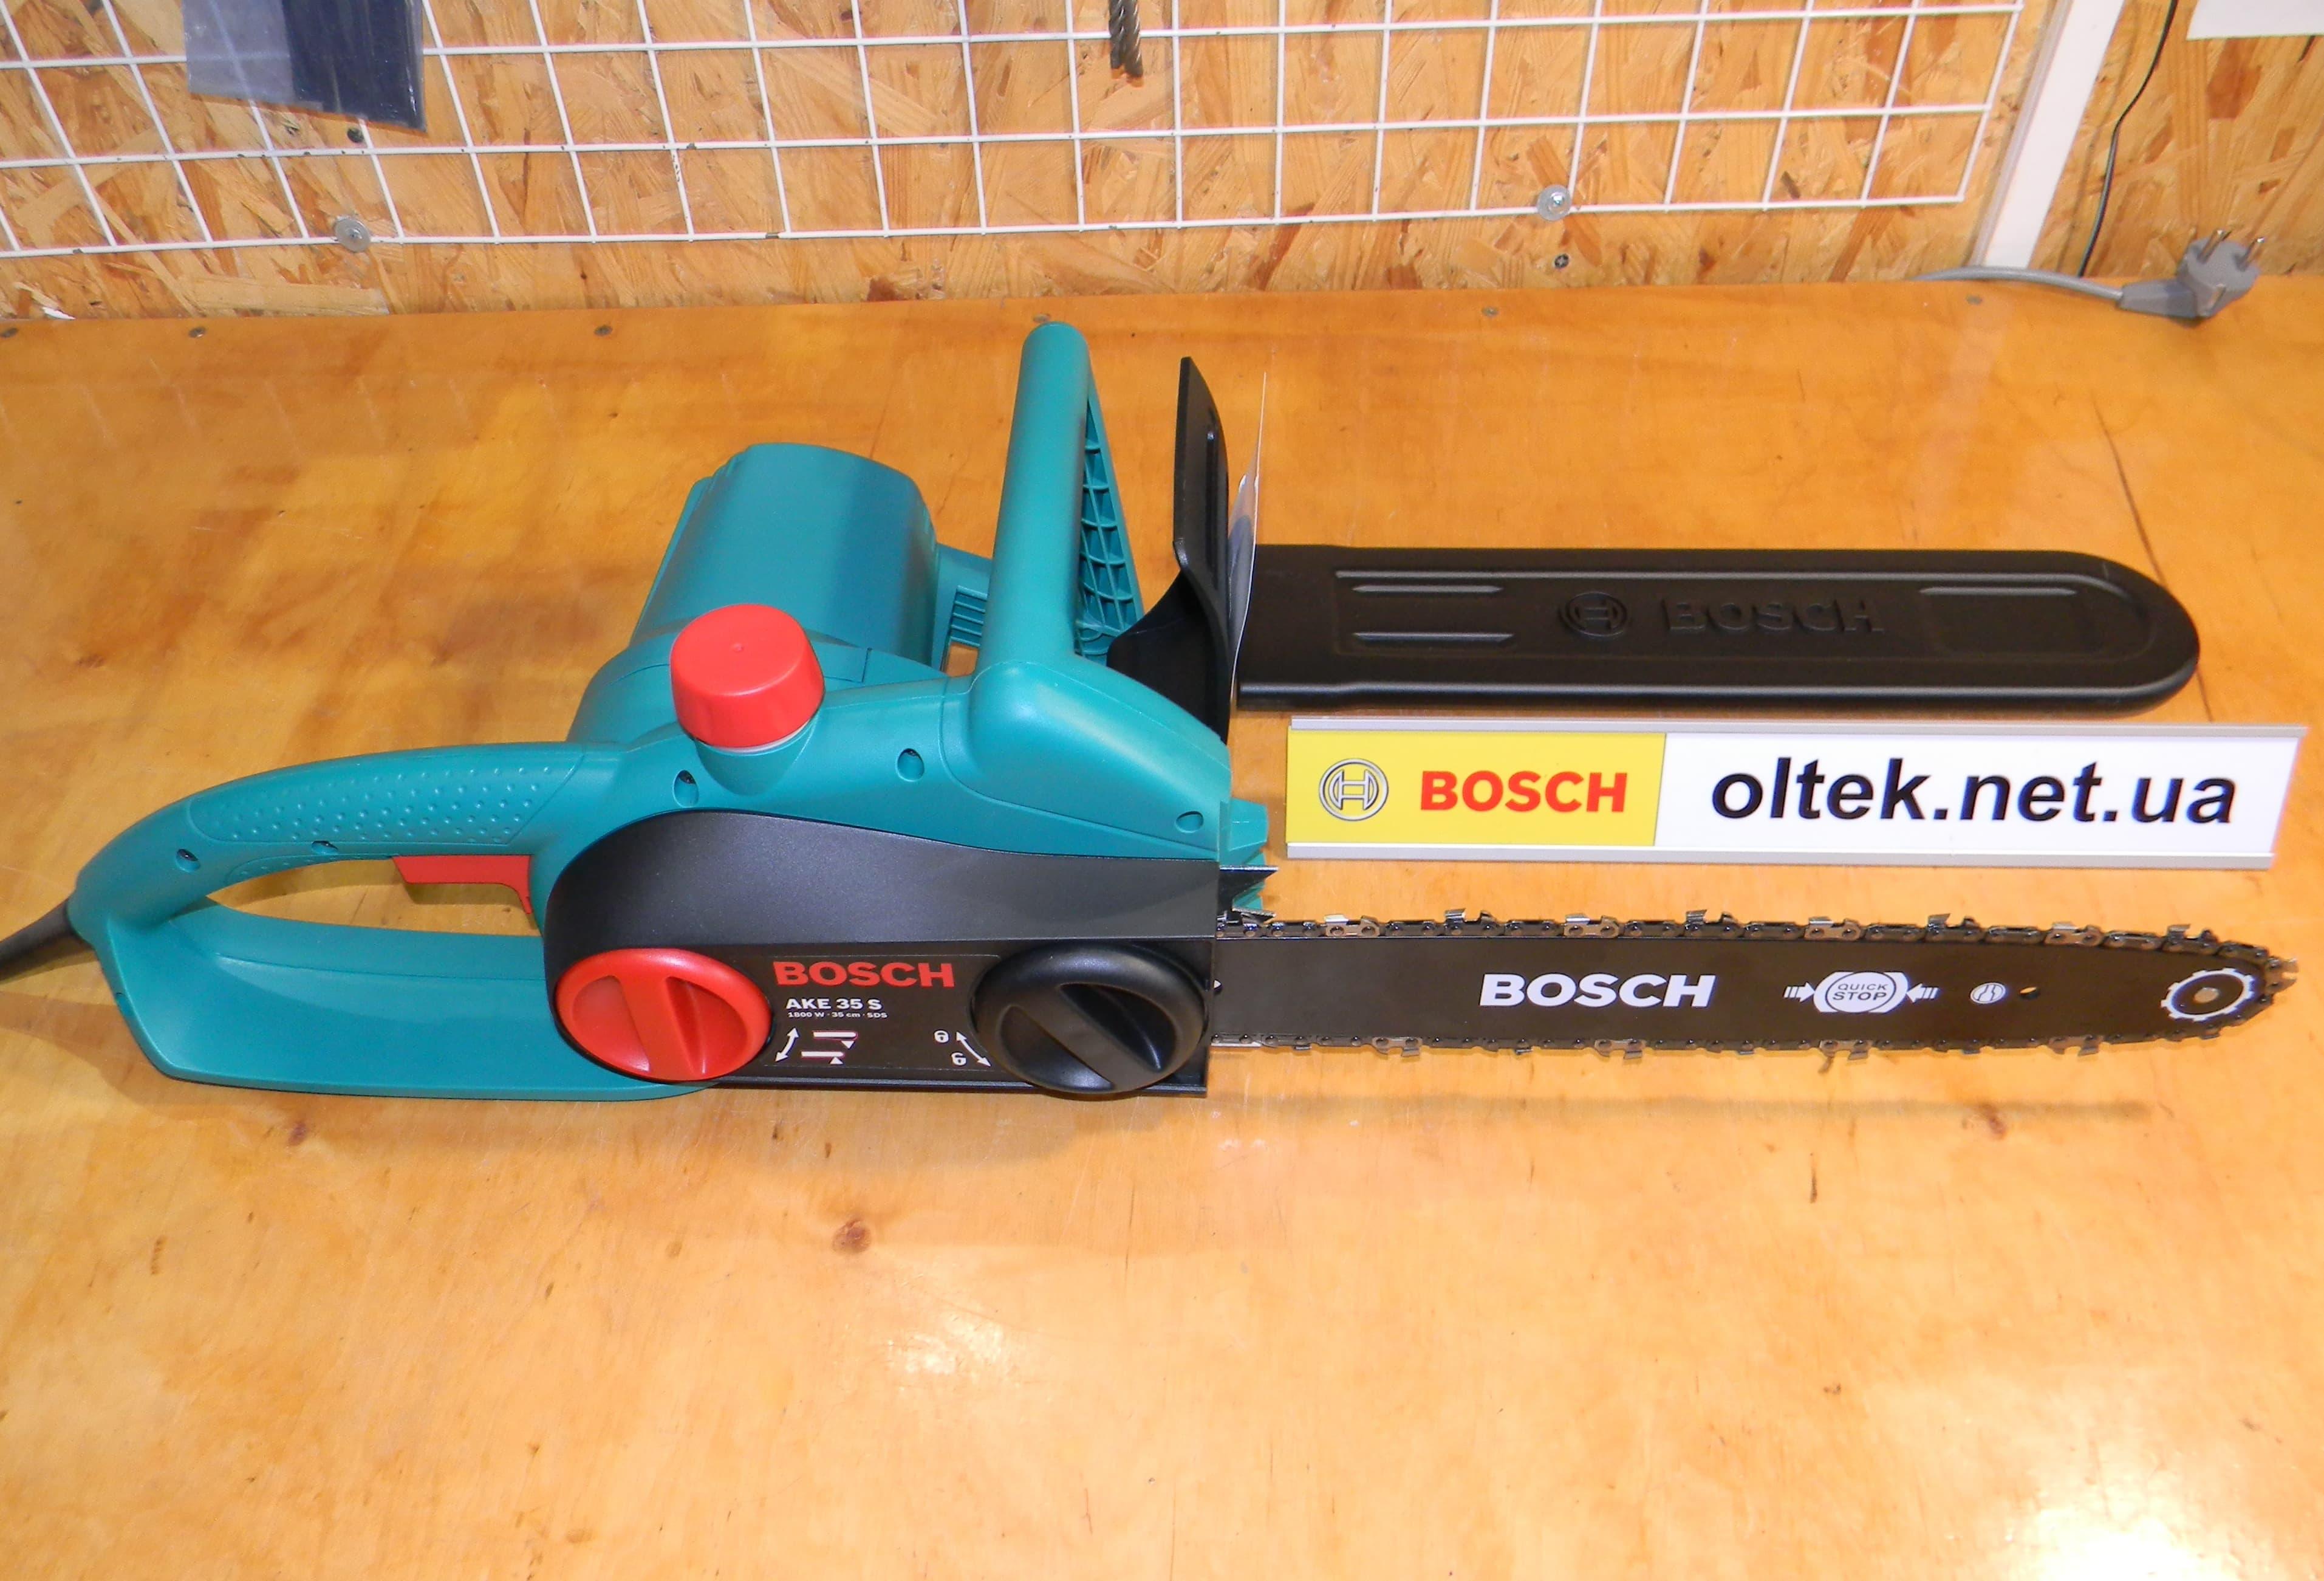 bosch-ake-35-s (1)